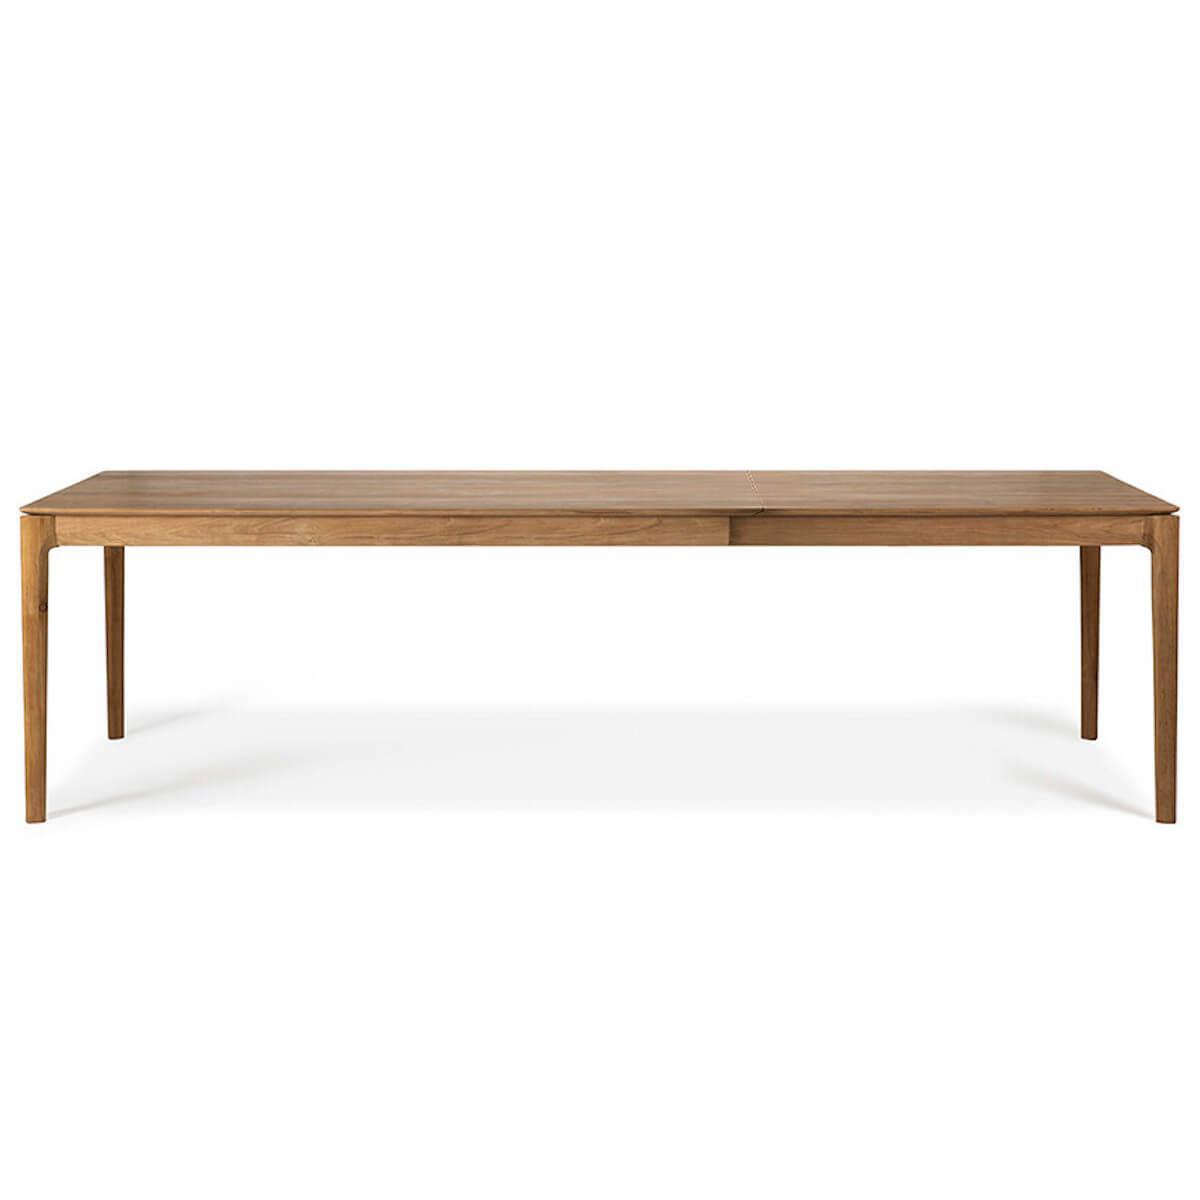 Table à rallonges 90x160/240cm BOX Ethnicraft teck